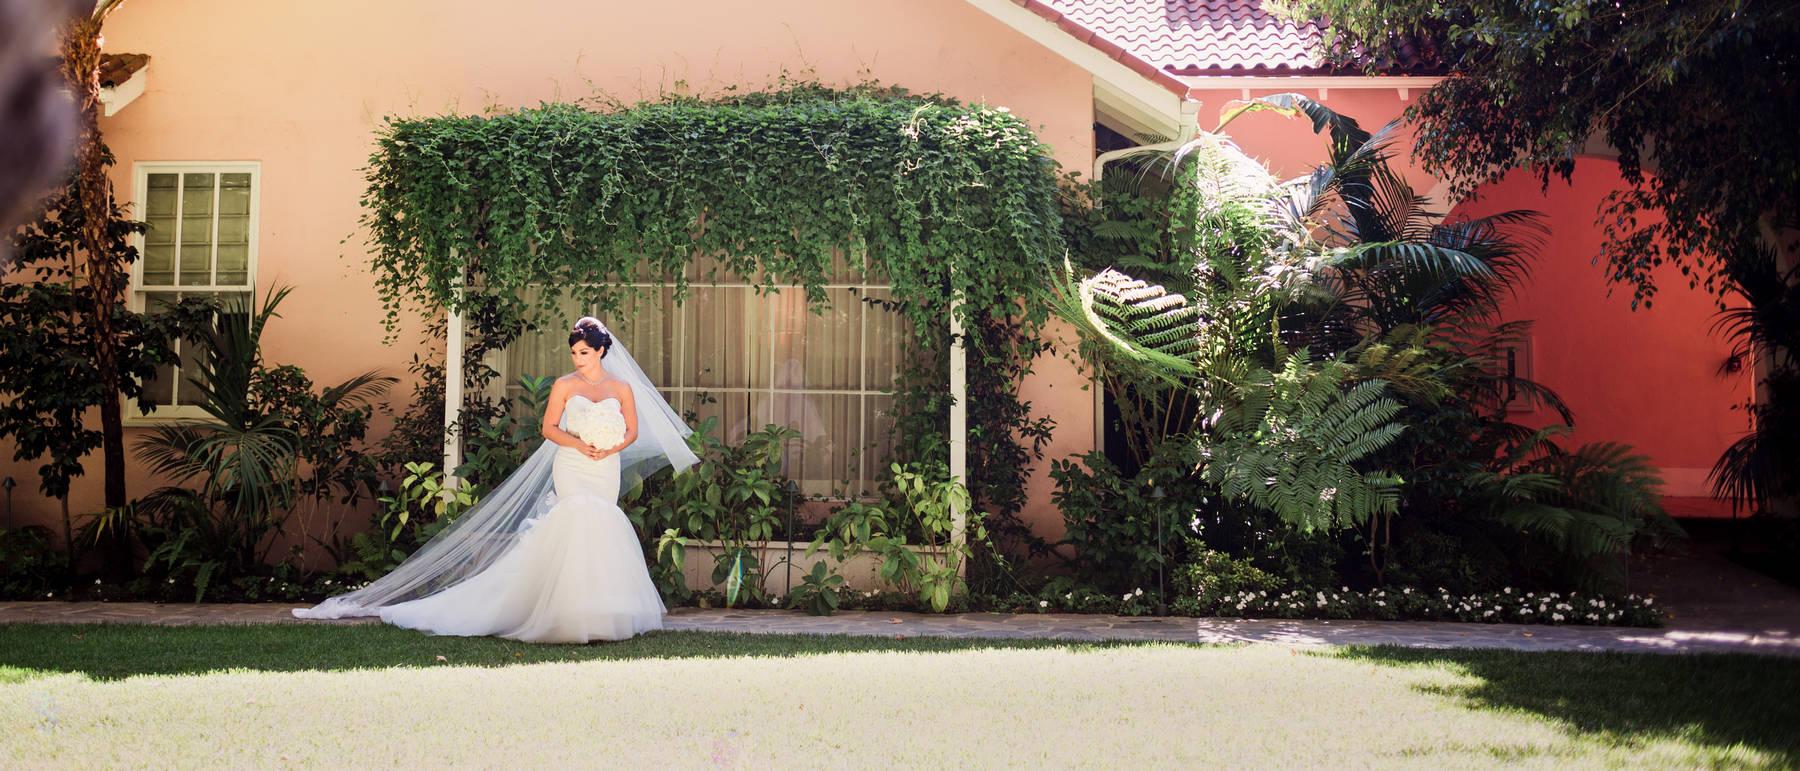 johnandjoseph-wedding-photographer-hz-slider-195